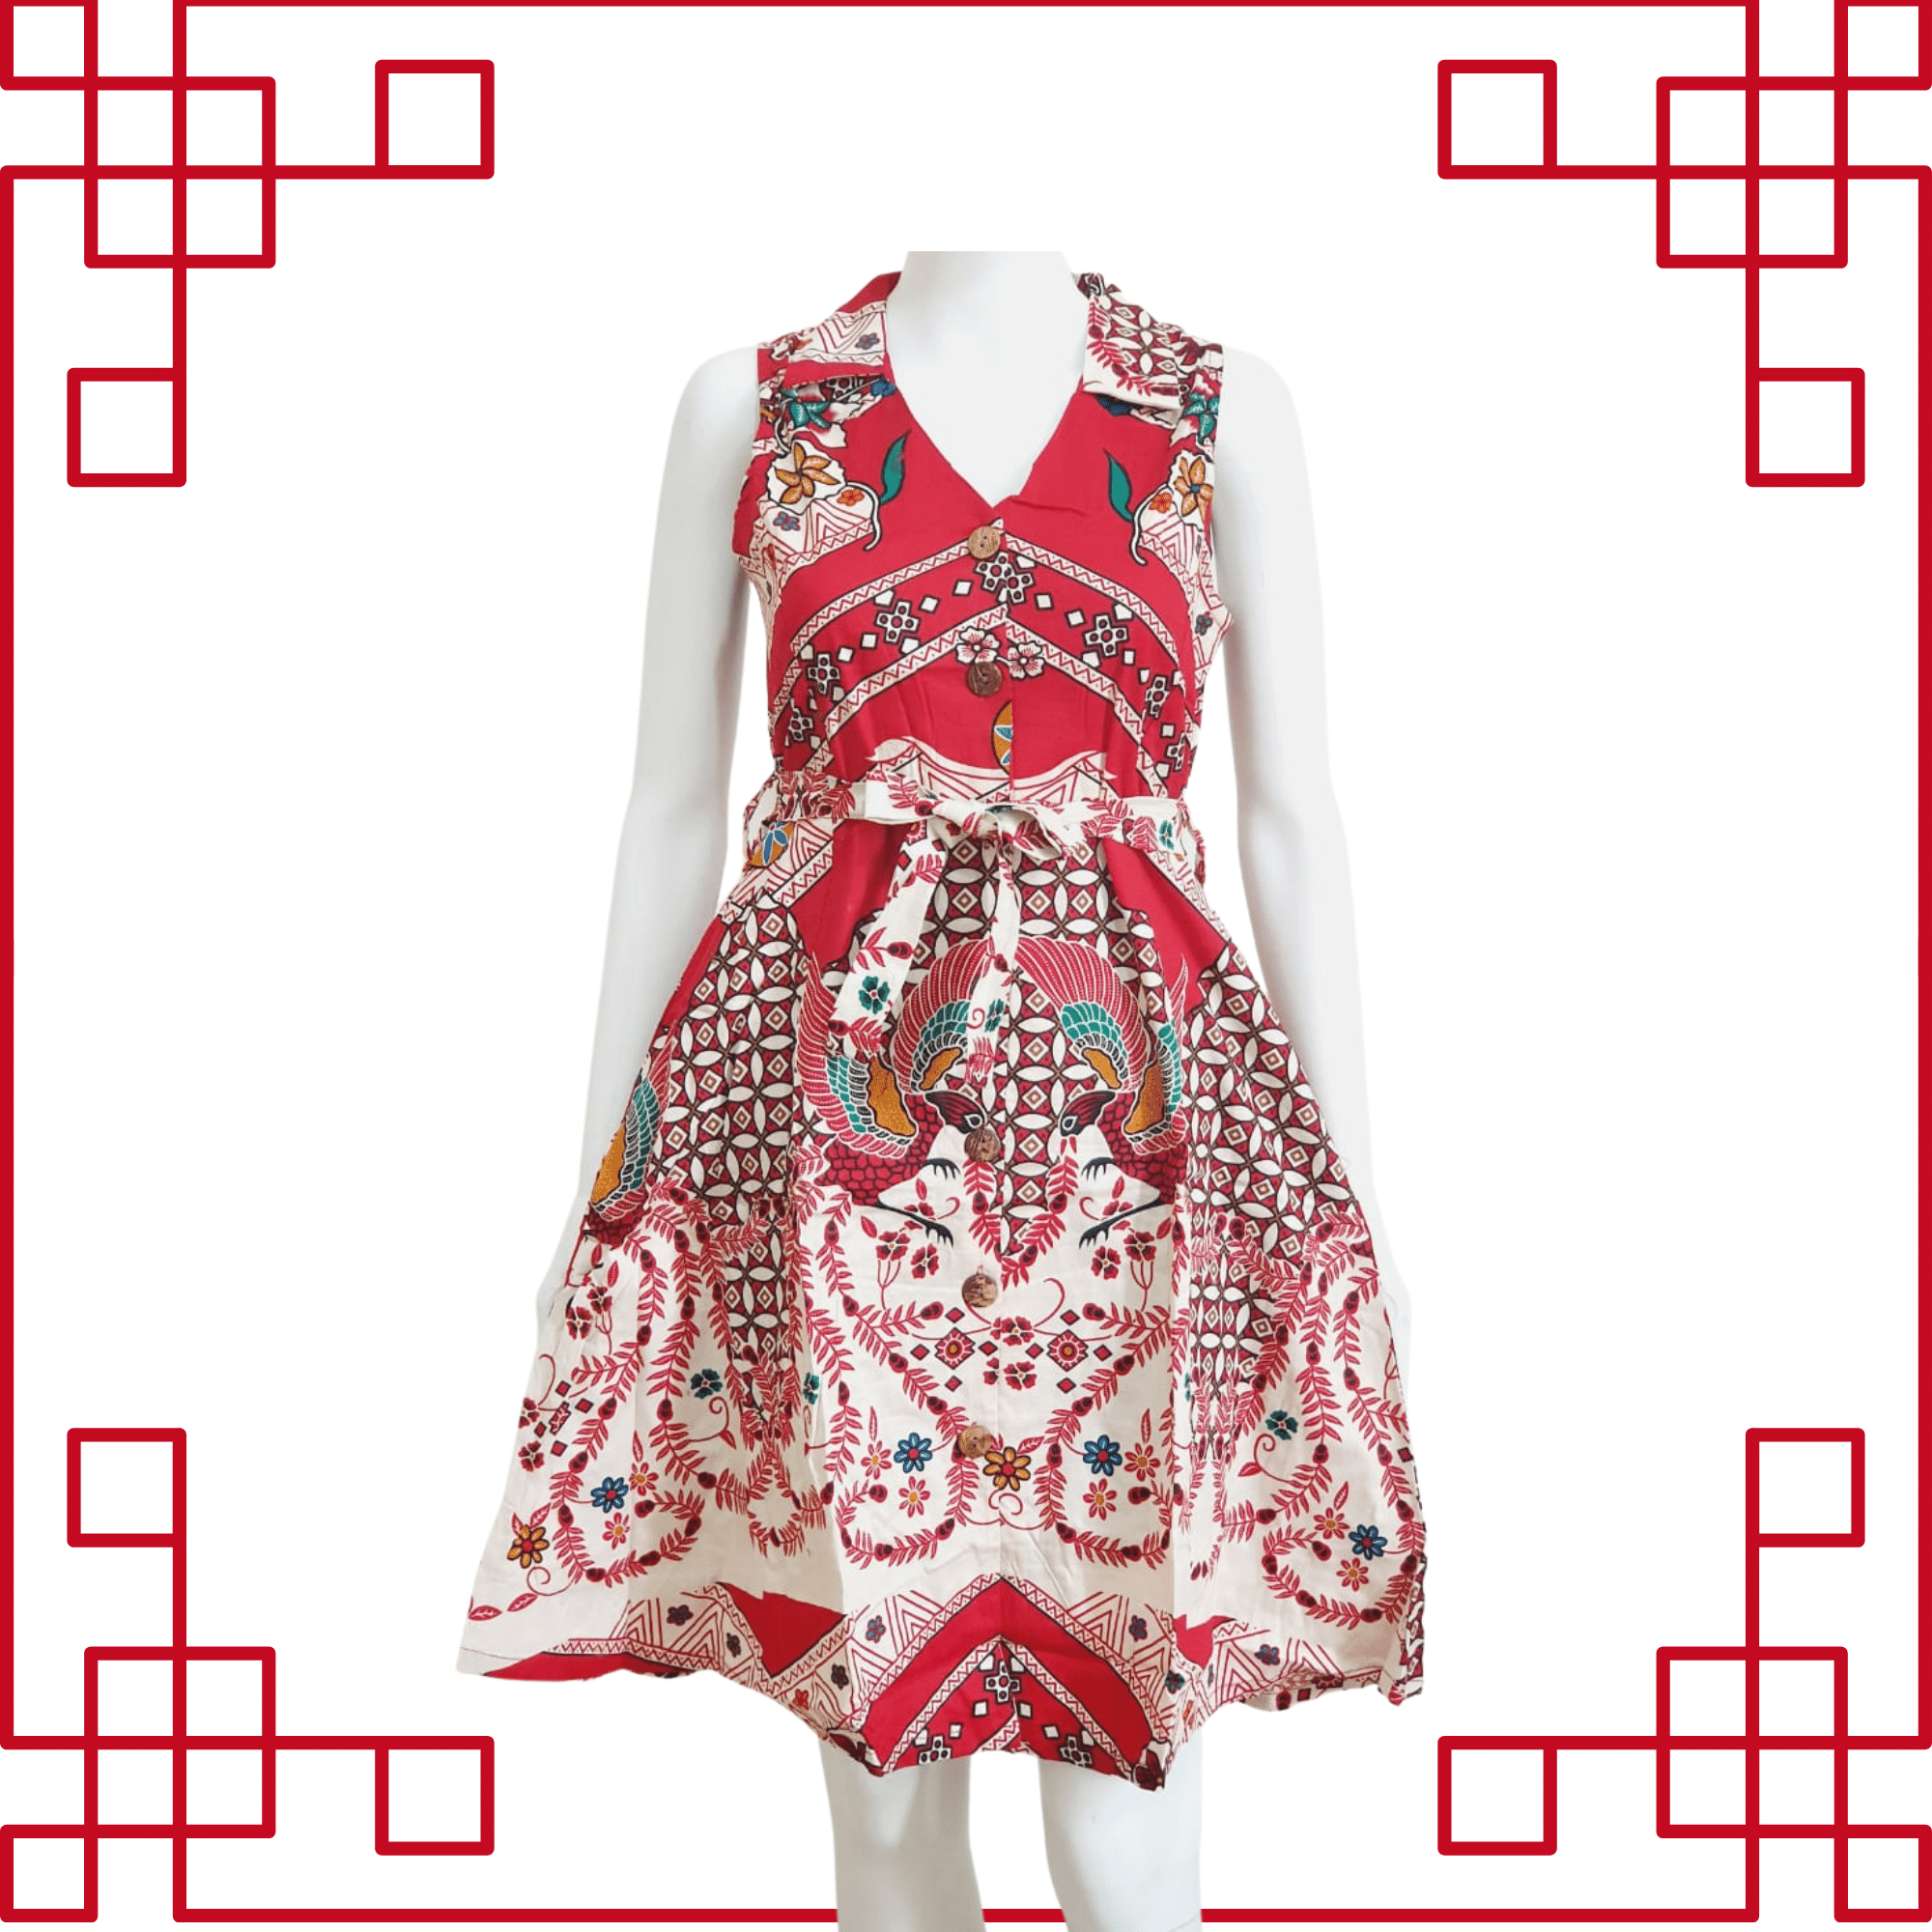 Cheongsam Batik Red Dress Sleeveless 723C